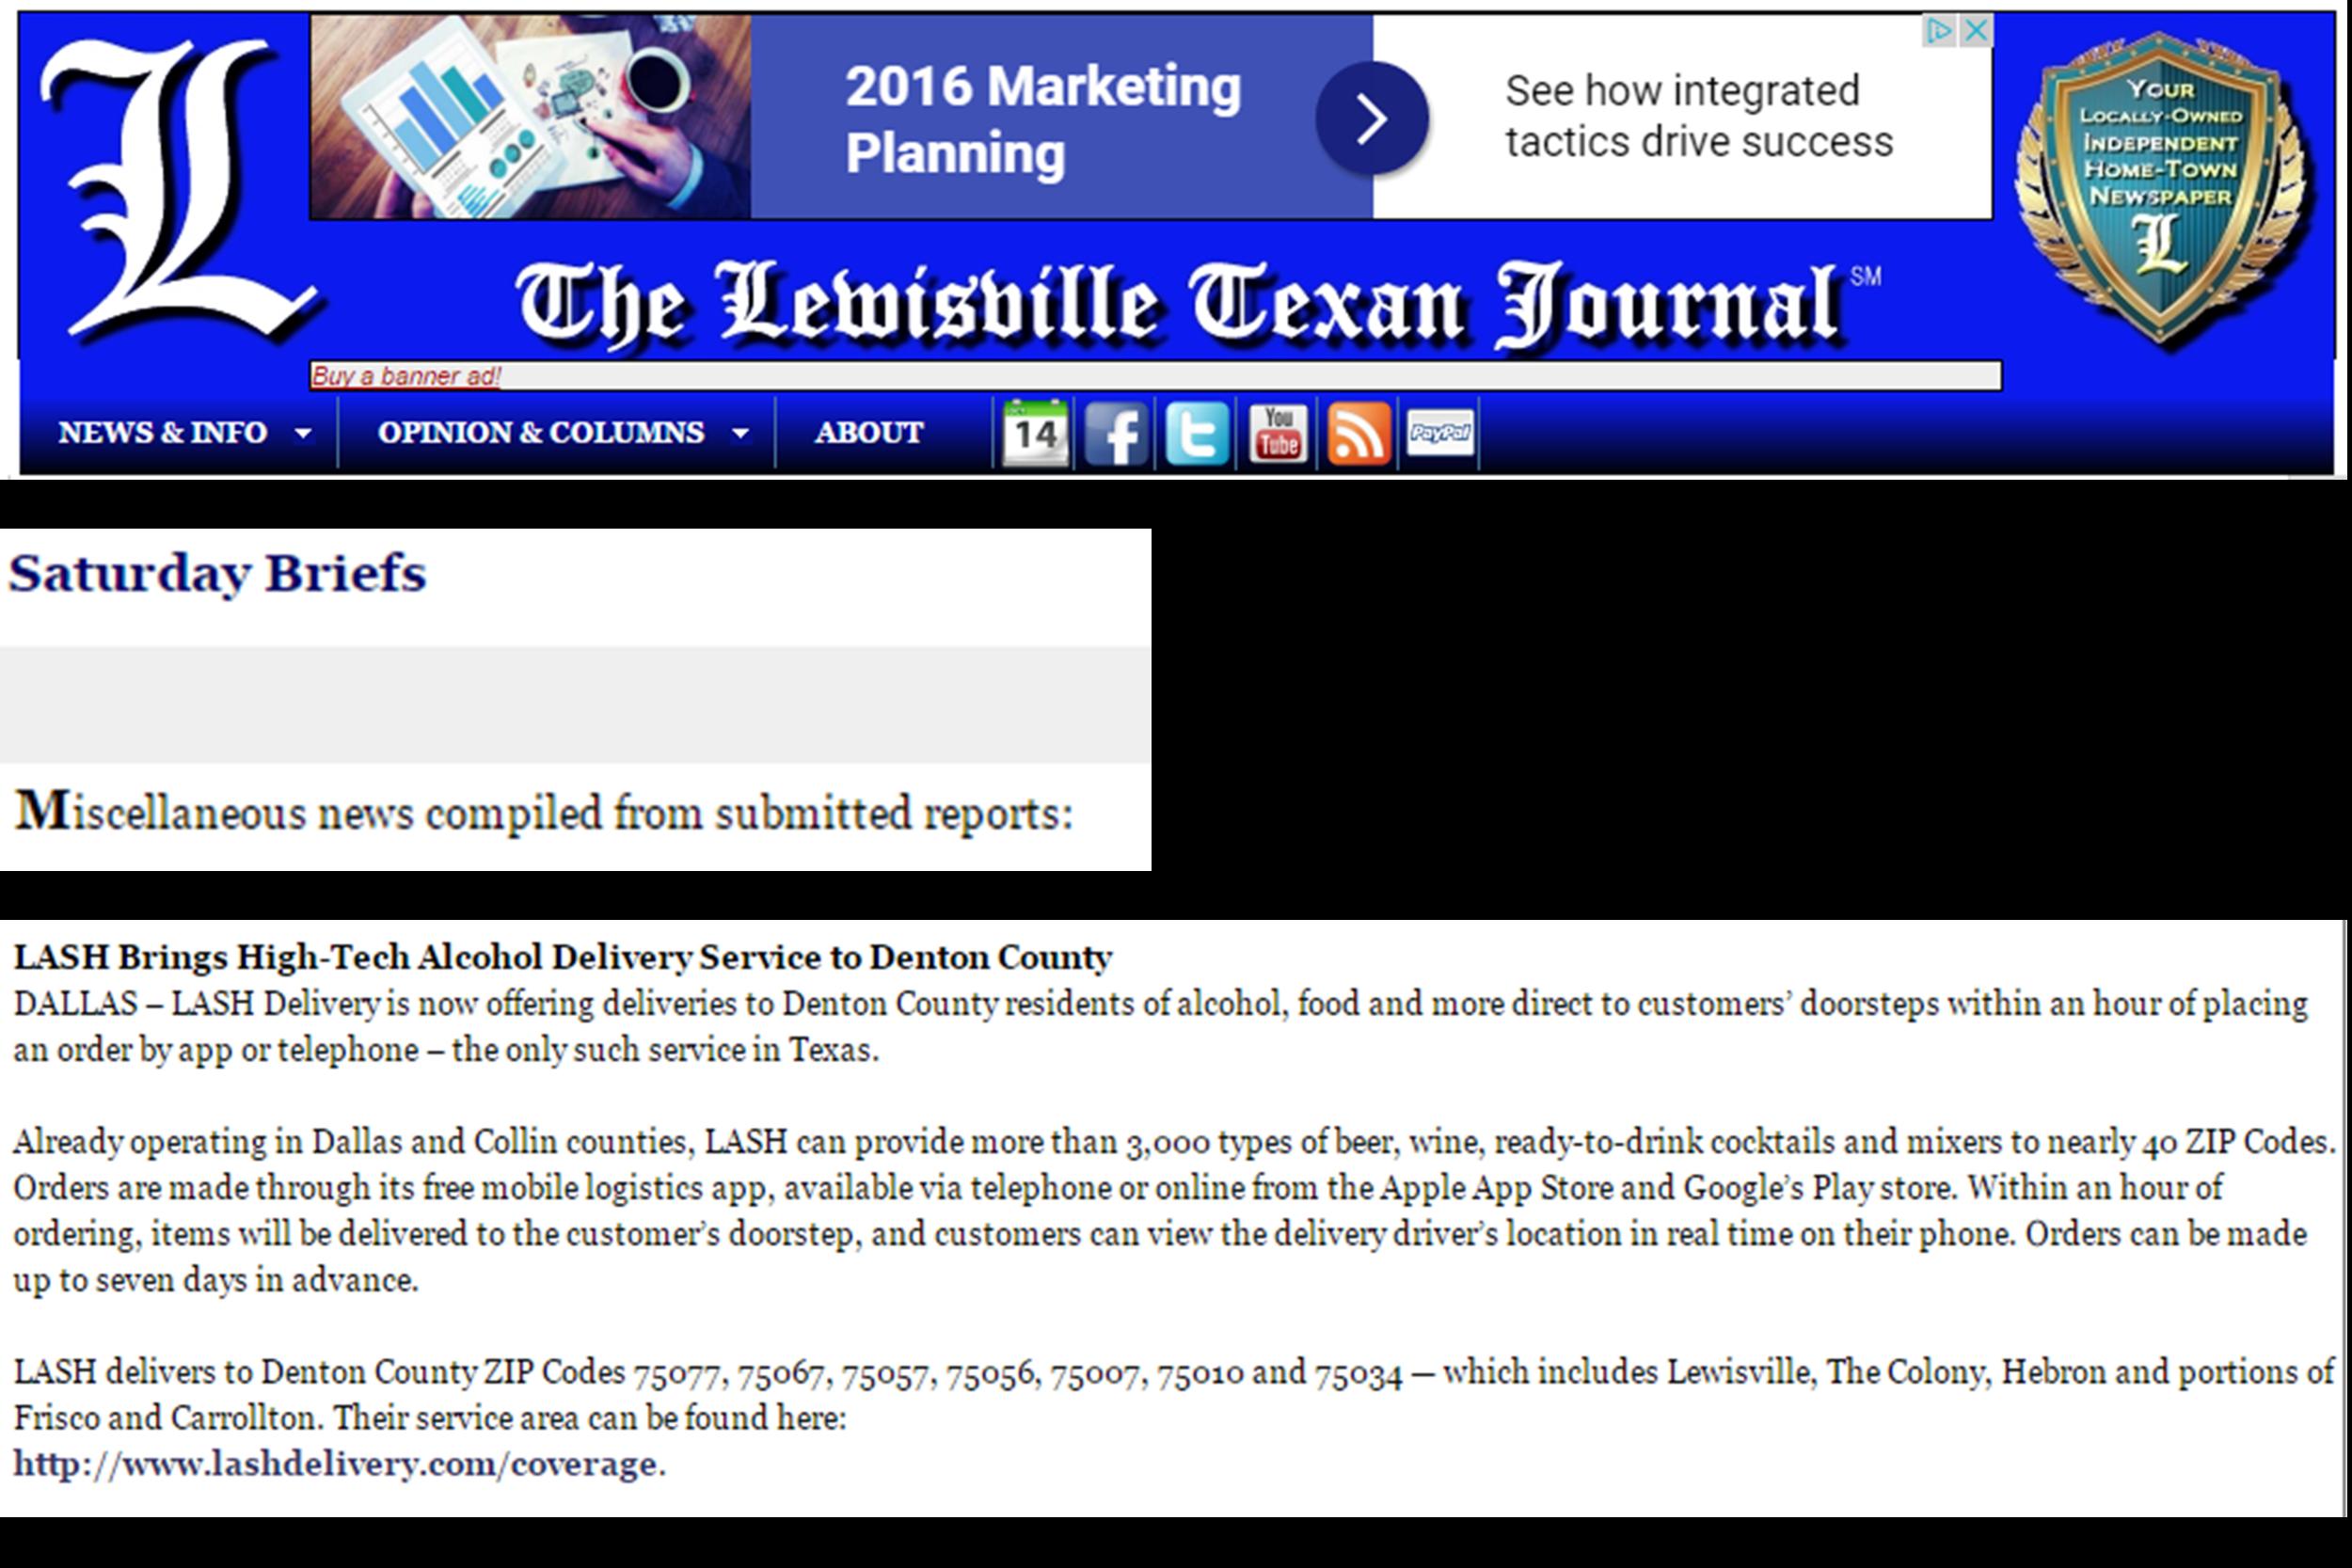 Lewisville Texan Journal.png